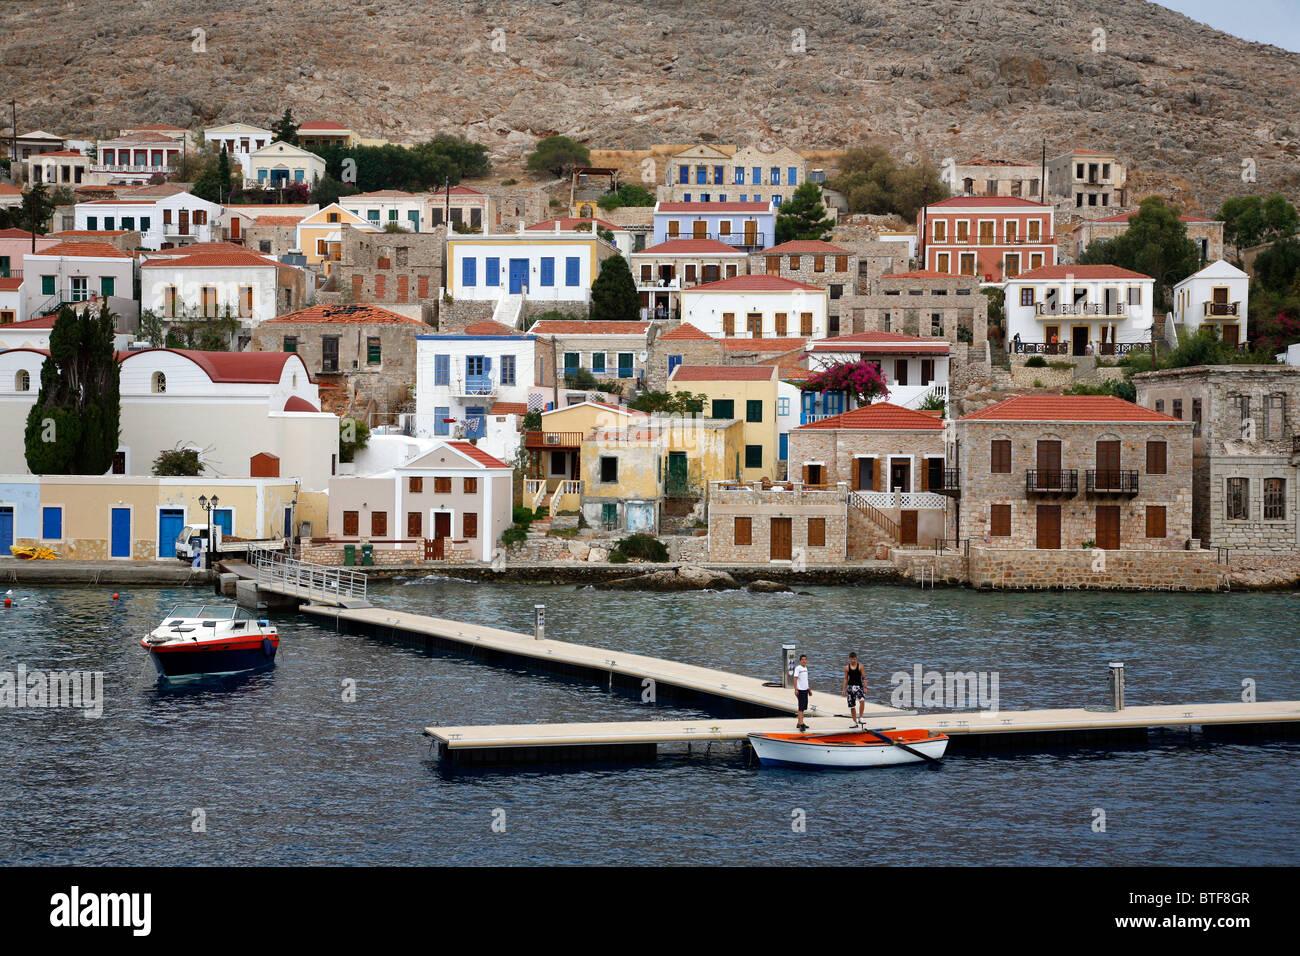 View over the port village Emborios, Halki, Greece. - Stock Image